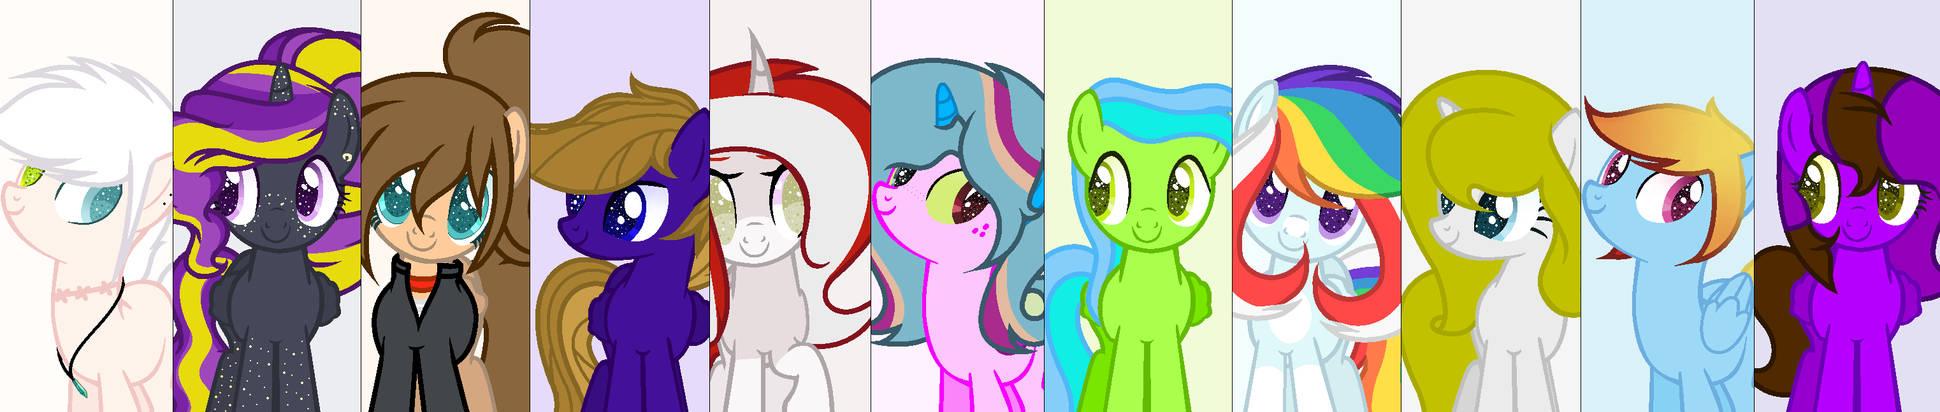 {MLP} - The best ponies